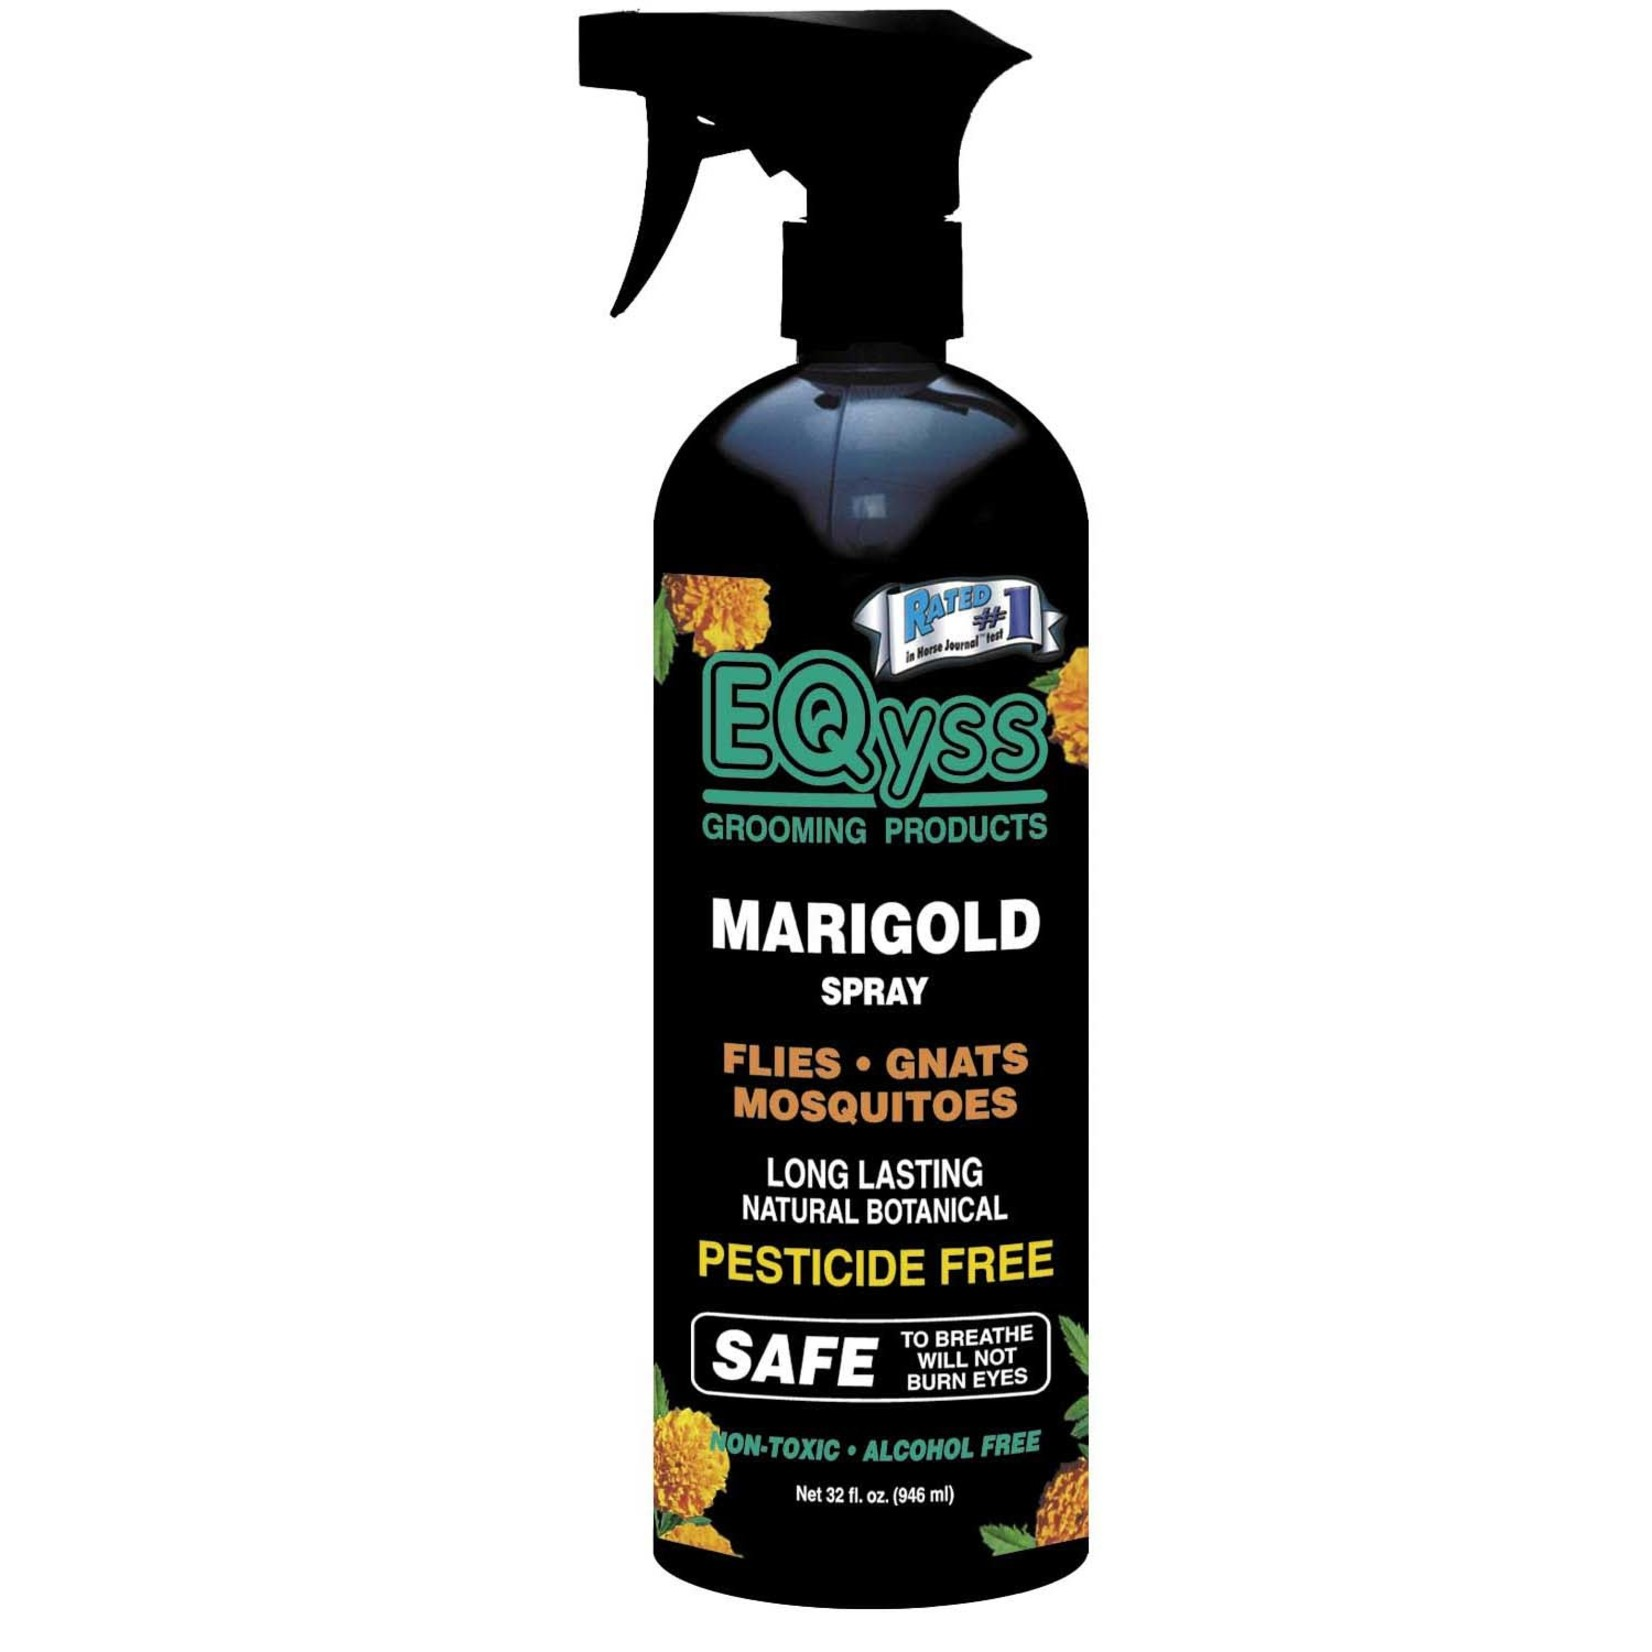 Eqyss - Marigold Spray